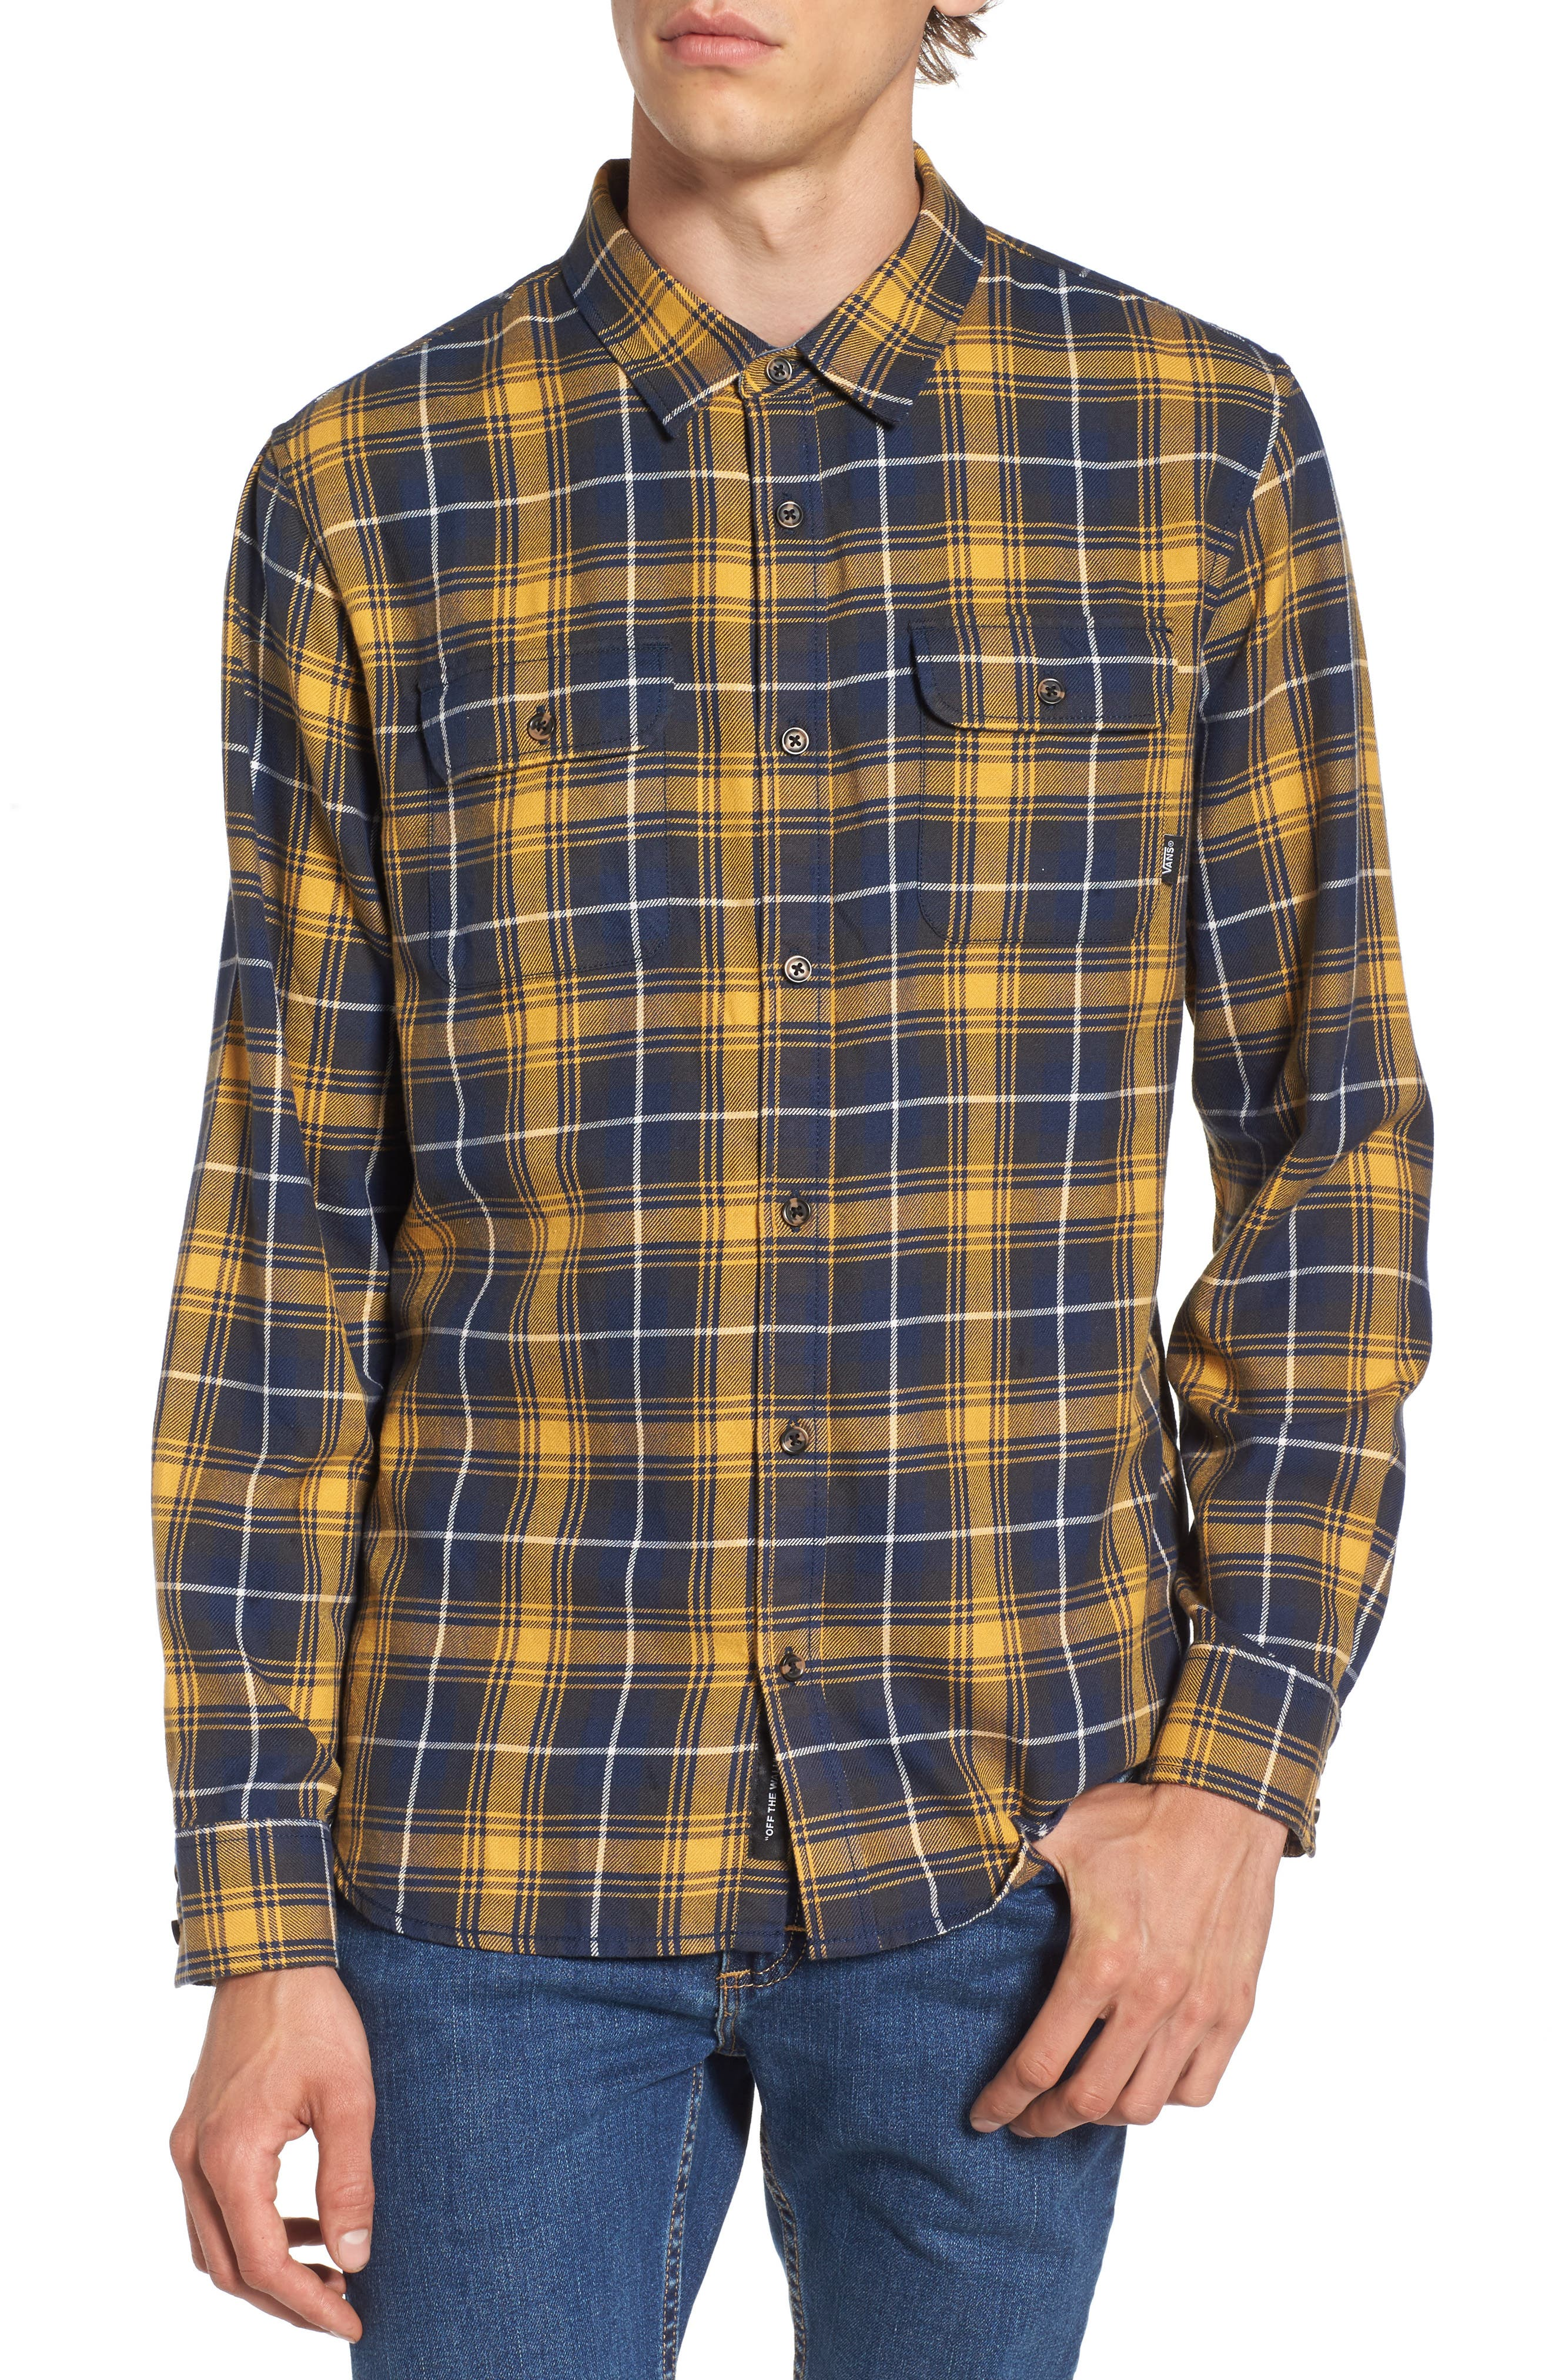 Vans Sycamore Plaid Flannel Sport Shirt